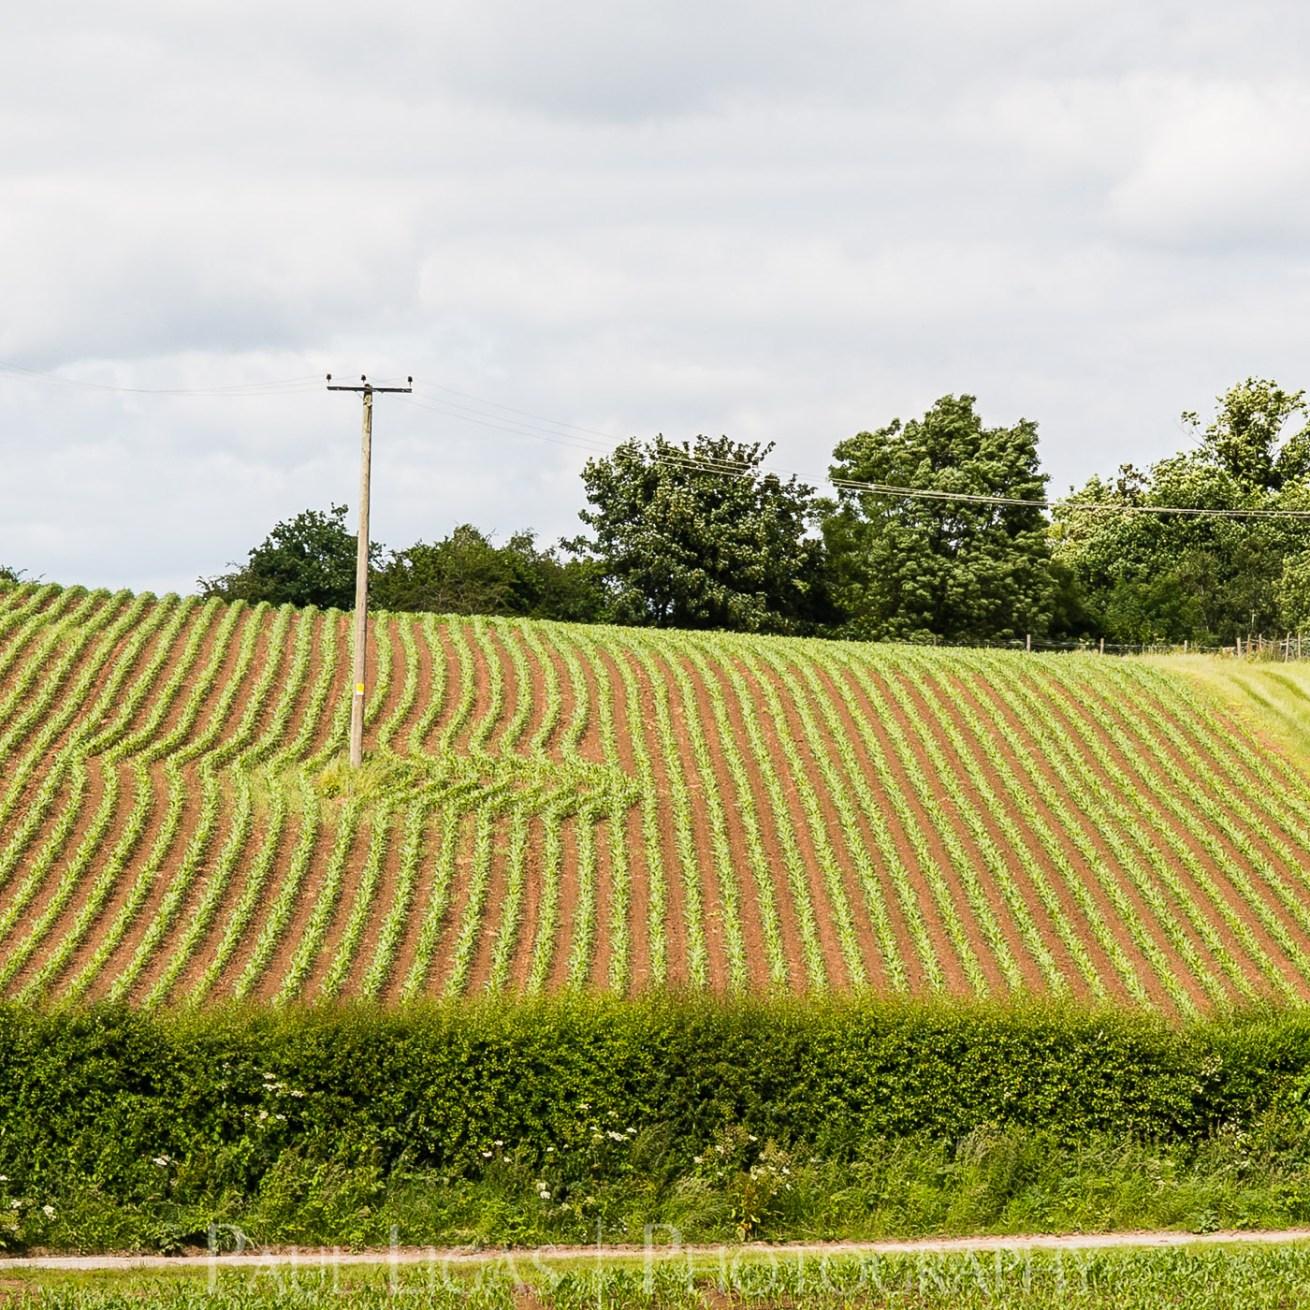 Townend Hop Farm, Herefordshire farming agriculture landscape photographer photography 8969